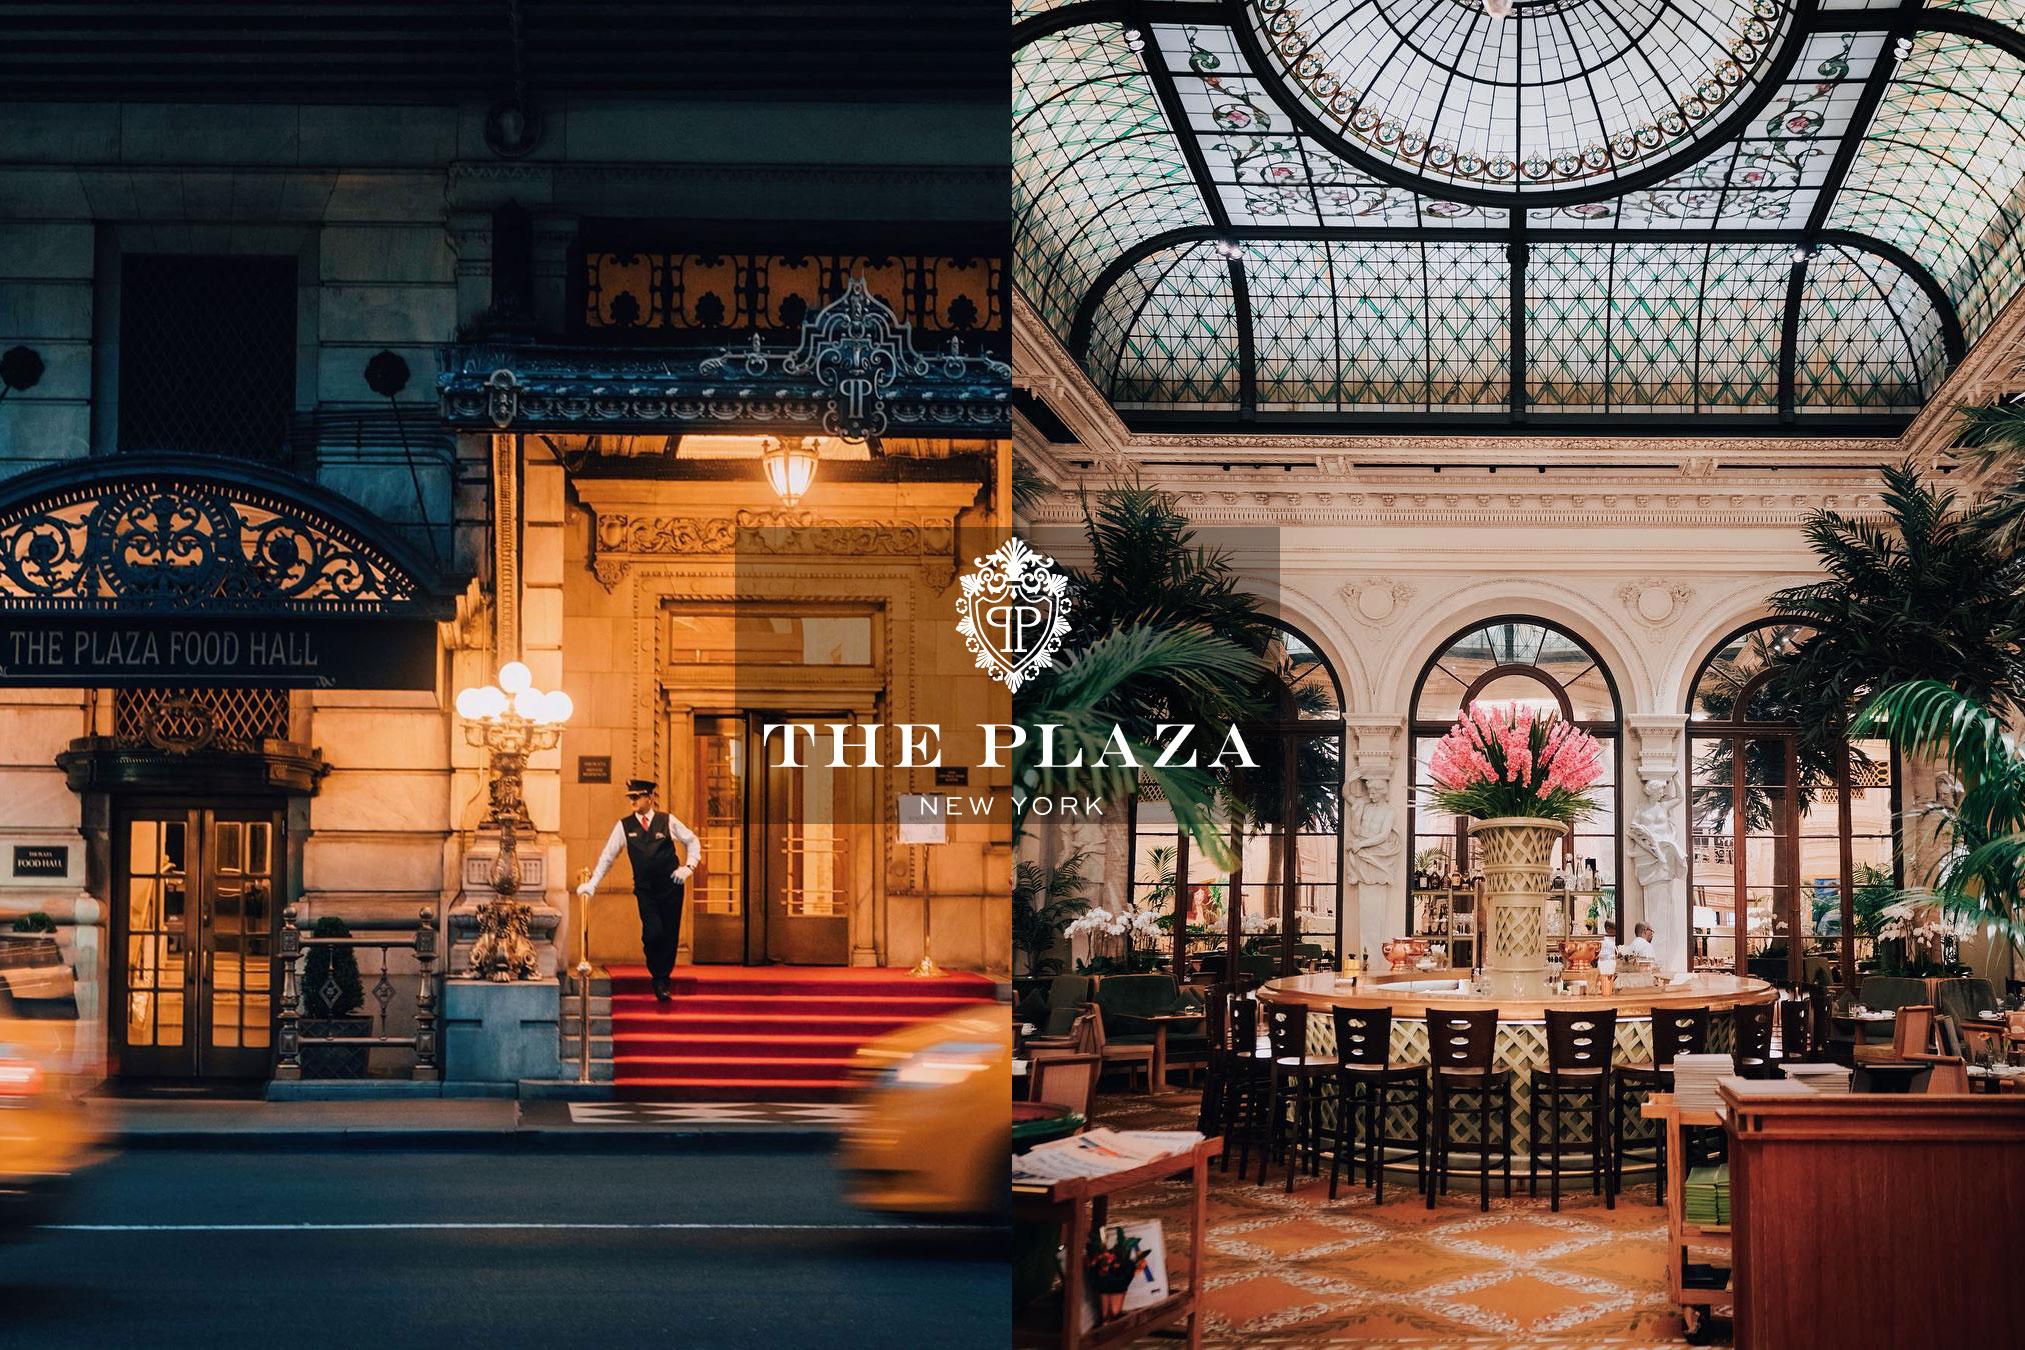 Plaza-Hotel-Joe-Thomas-Photography-New-York.jpg